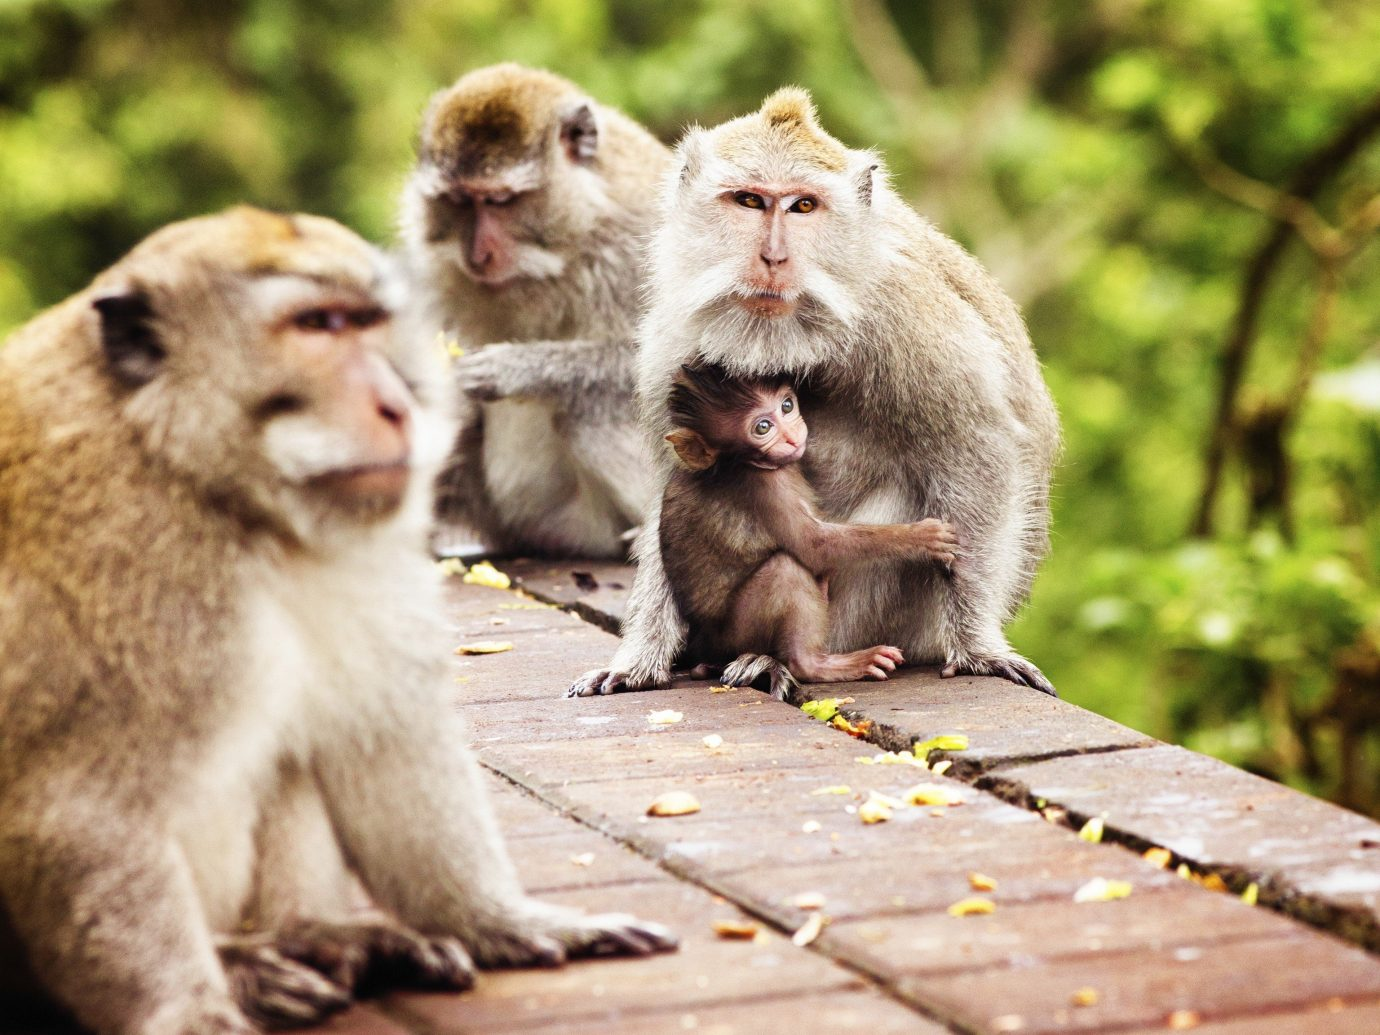 Travel Tips primate ground outdoor mammal monkey tree animal macaque vertebrate fauna old world monkey Wildlife